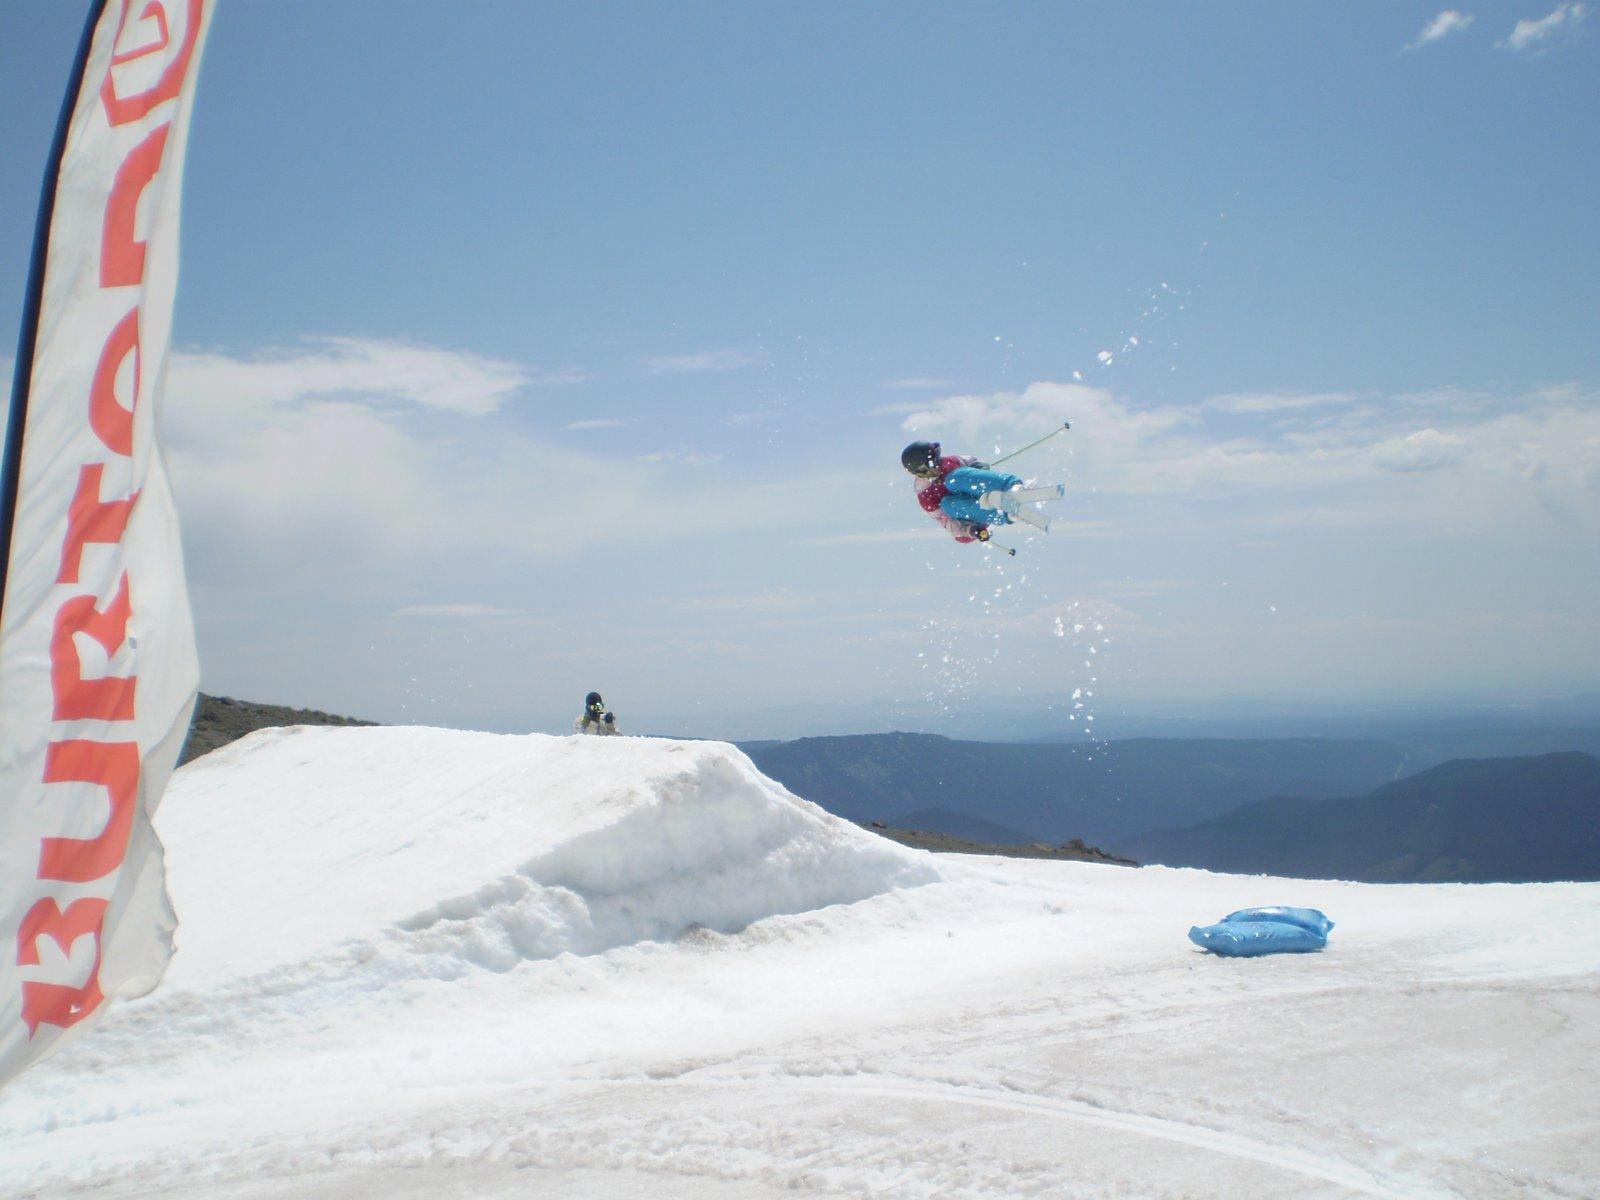 Windells first jump